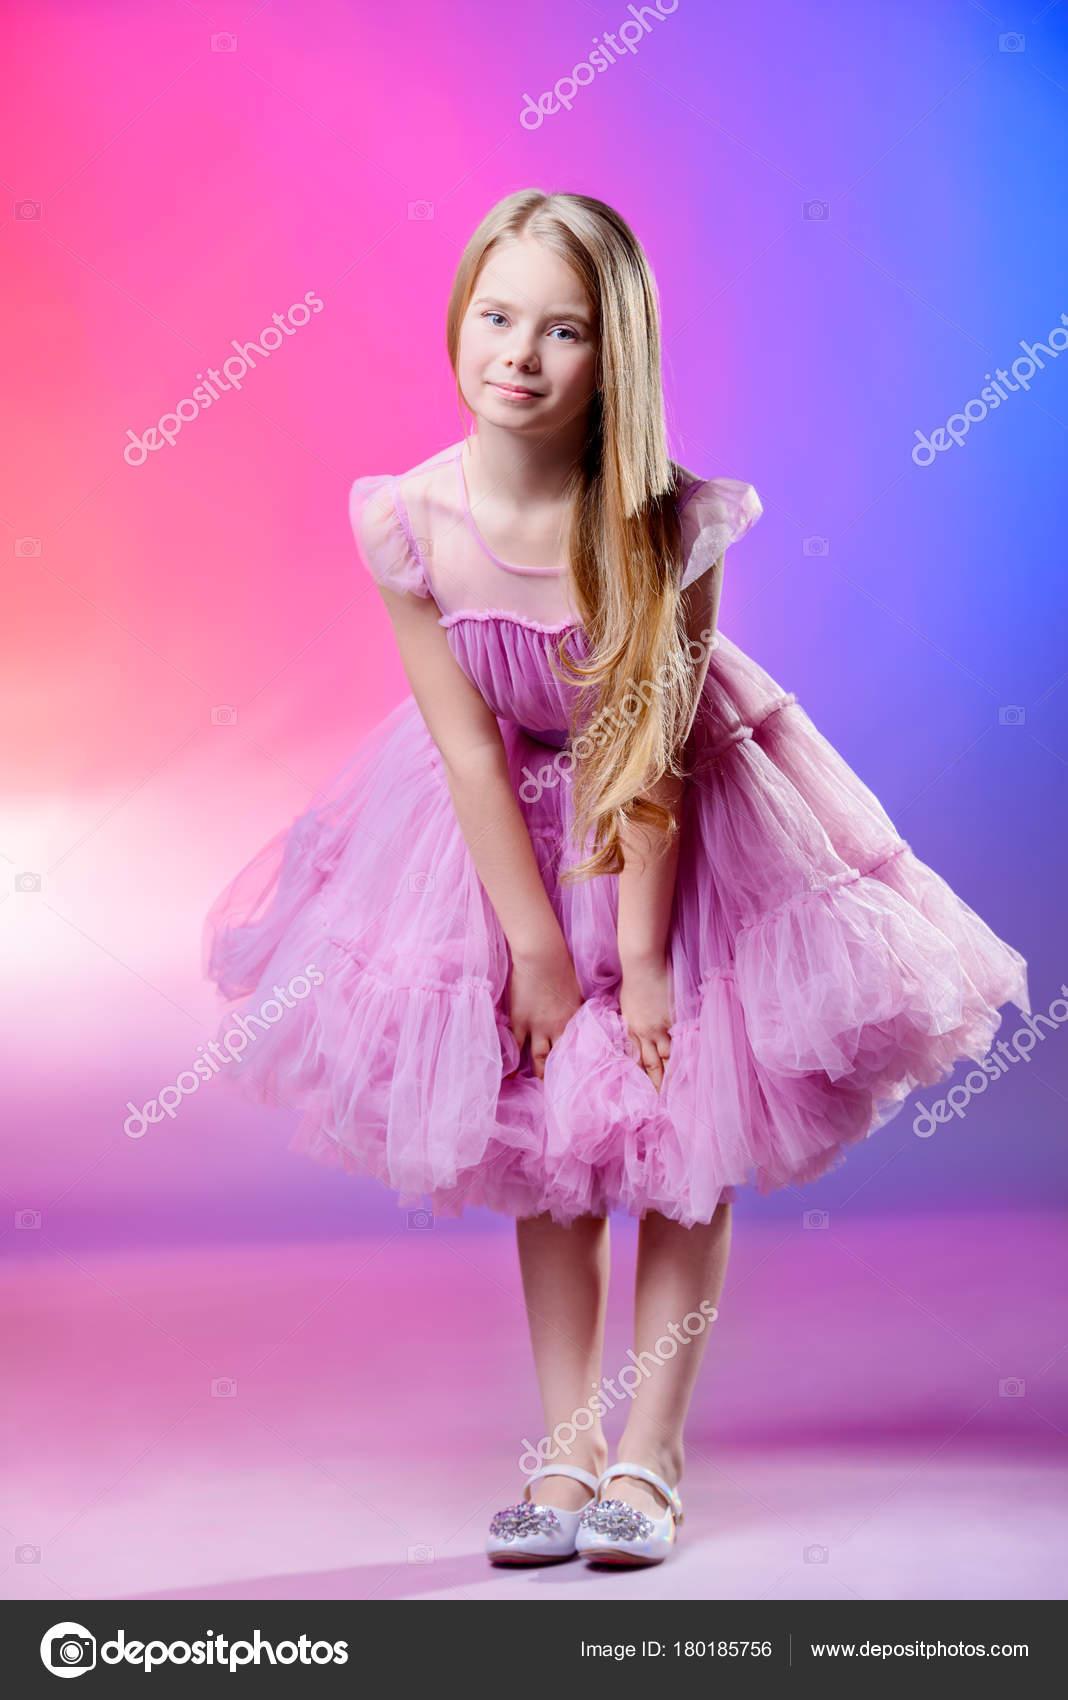 chica en vestido esponjoso — Foto de stock © prometeus #180185756